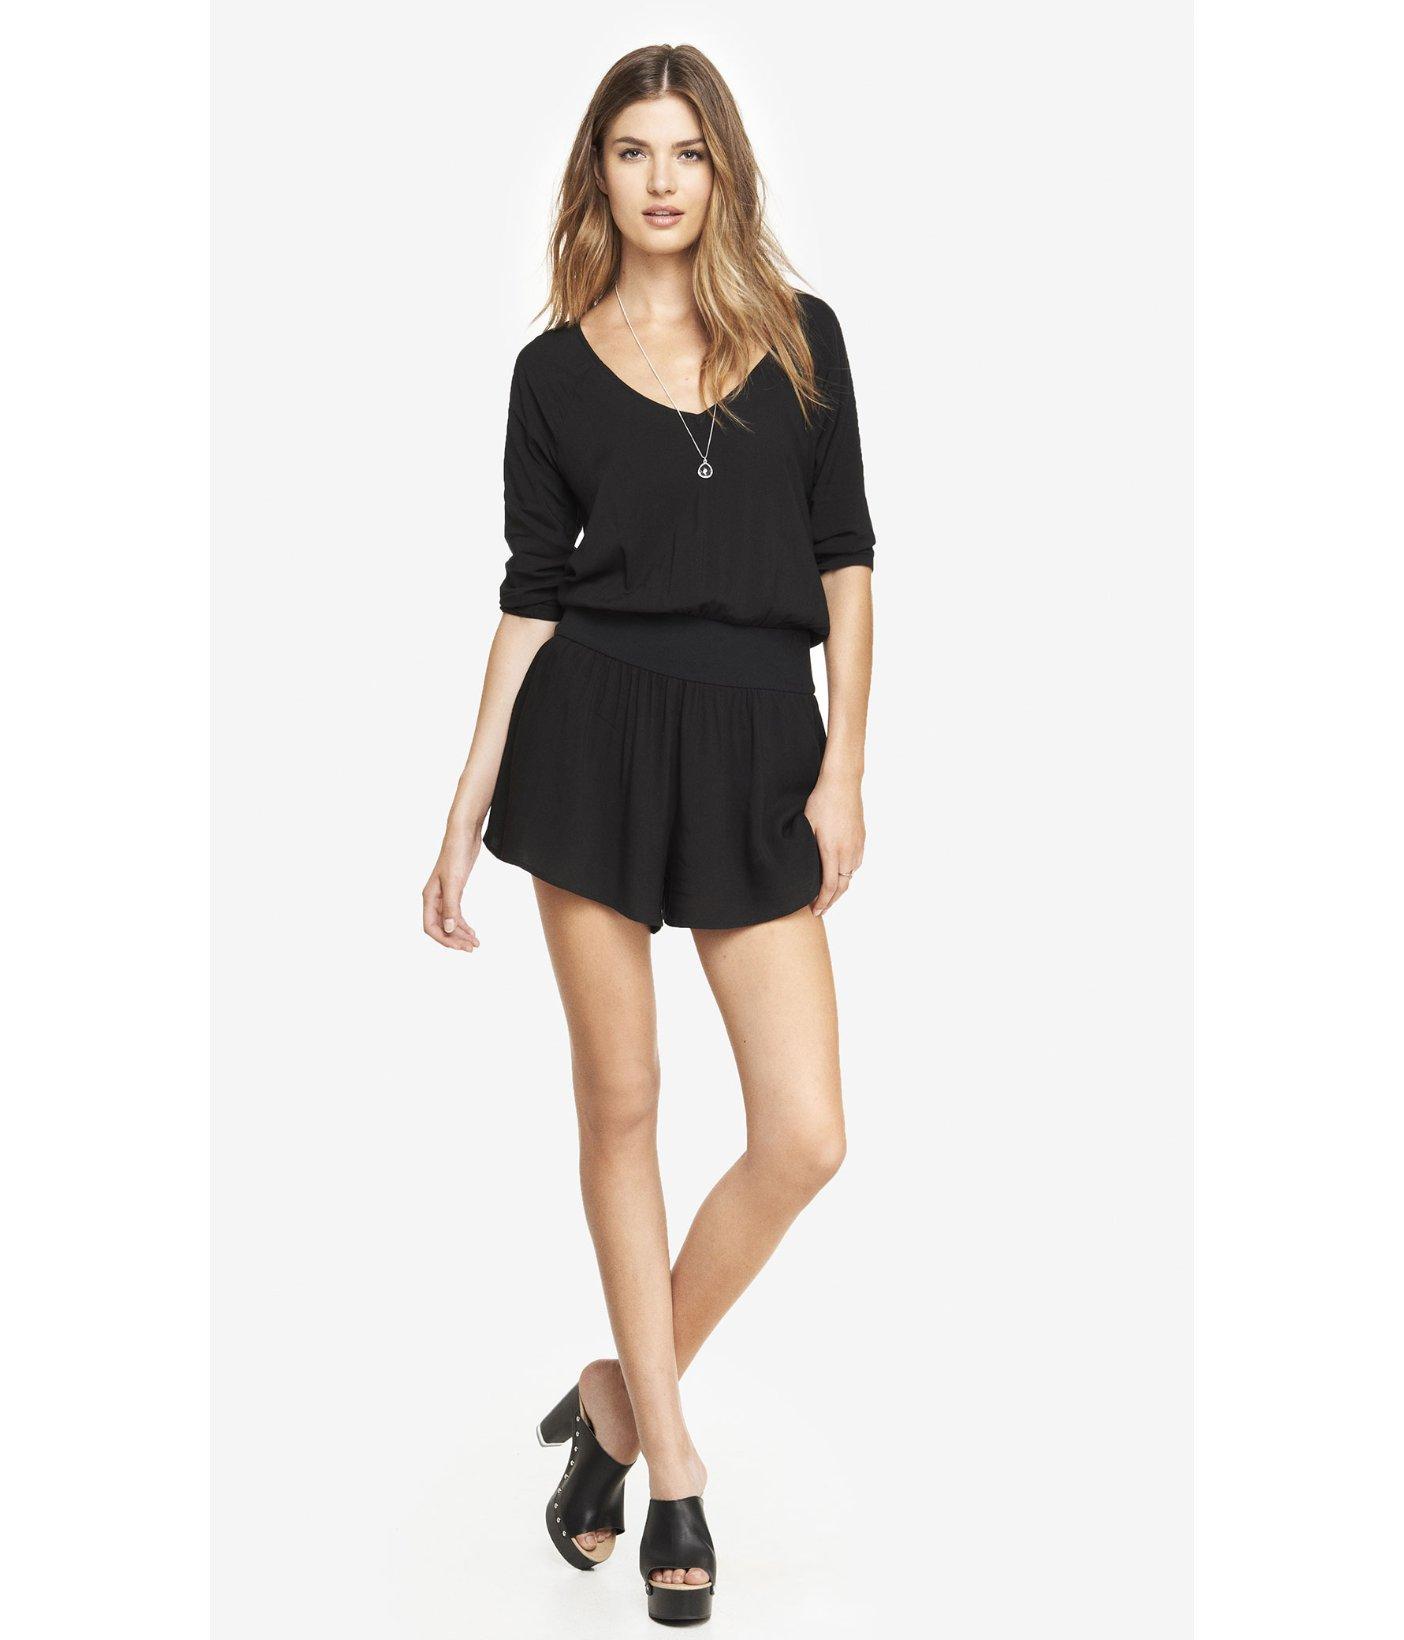 a660389d9cdd Lyst - Express Deep V-Neck Knit Waist Romper - Black in Black